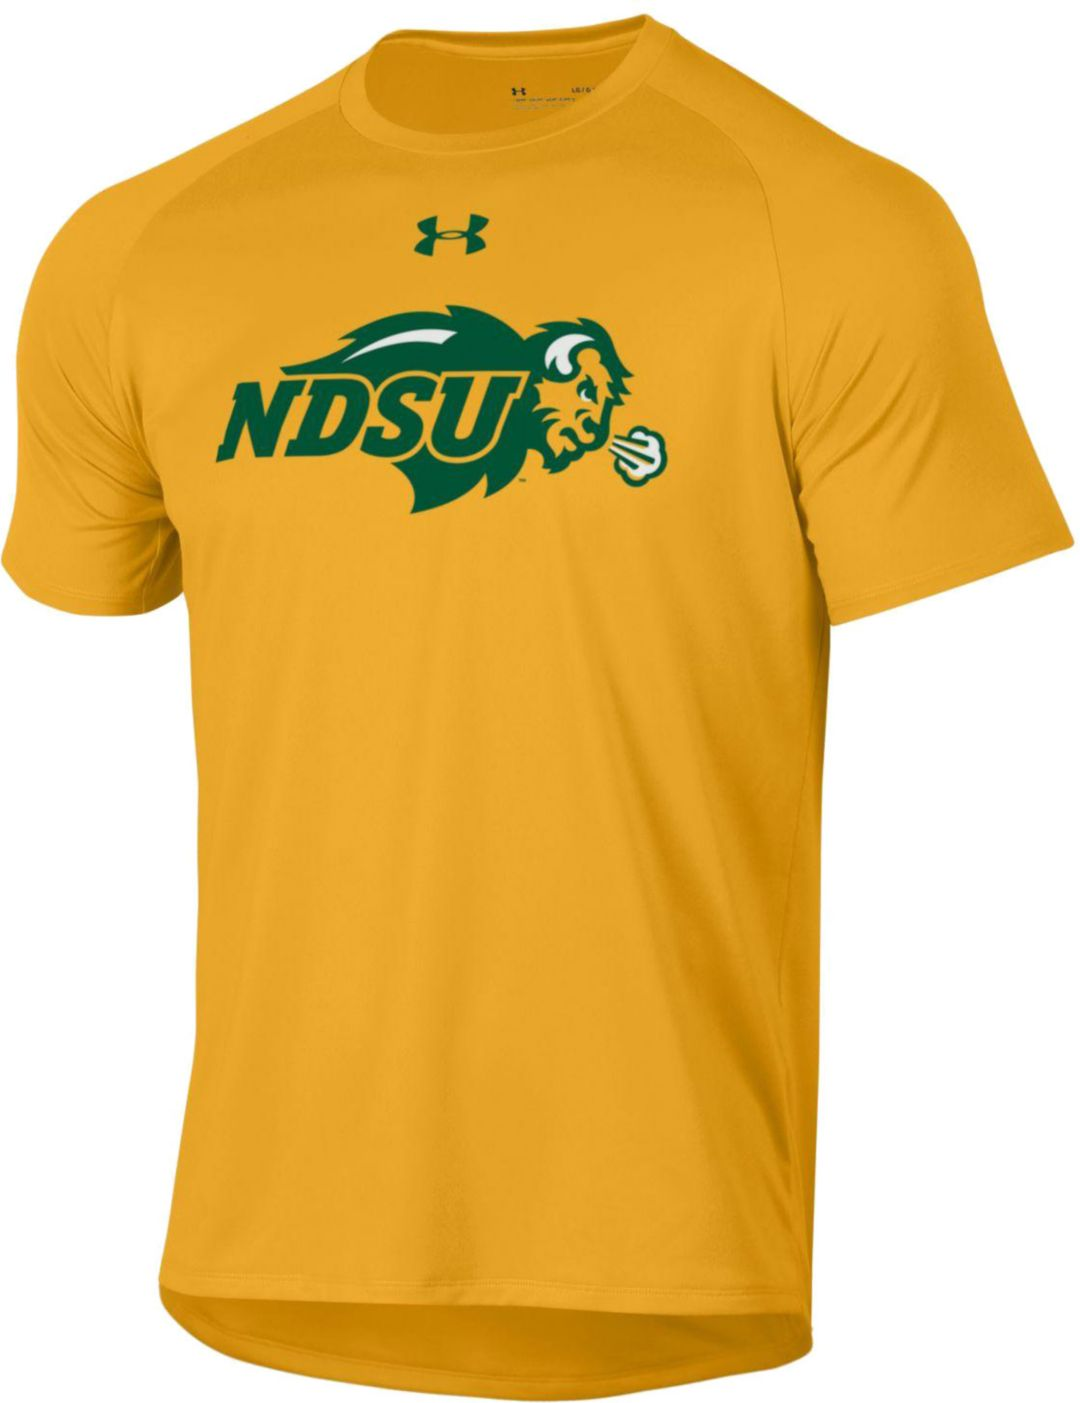 c94e8e1f72 Under Armour Men's North Dakota State Bison Yellow Tech Performance T-Shirt